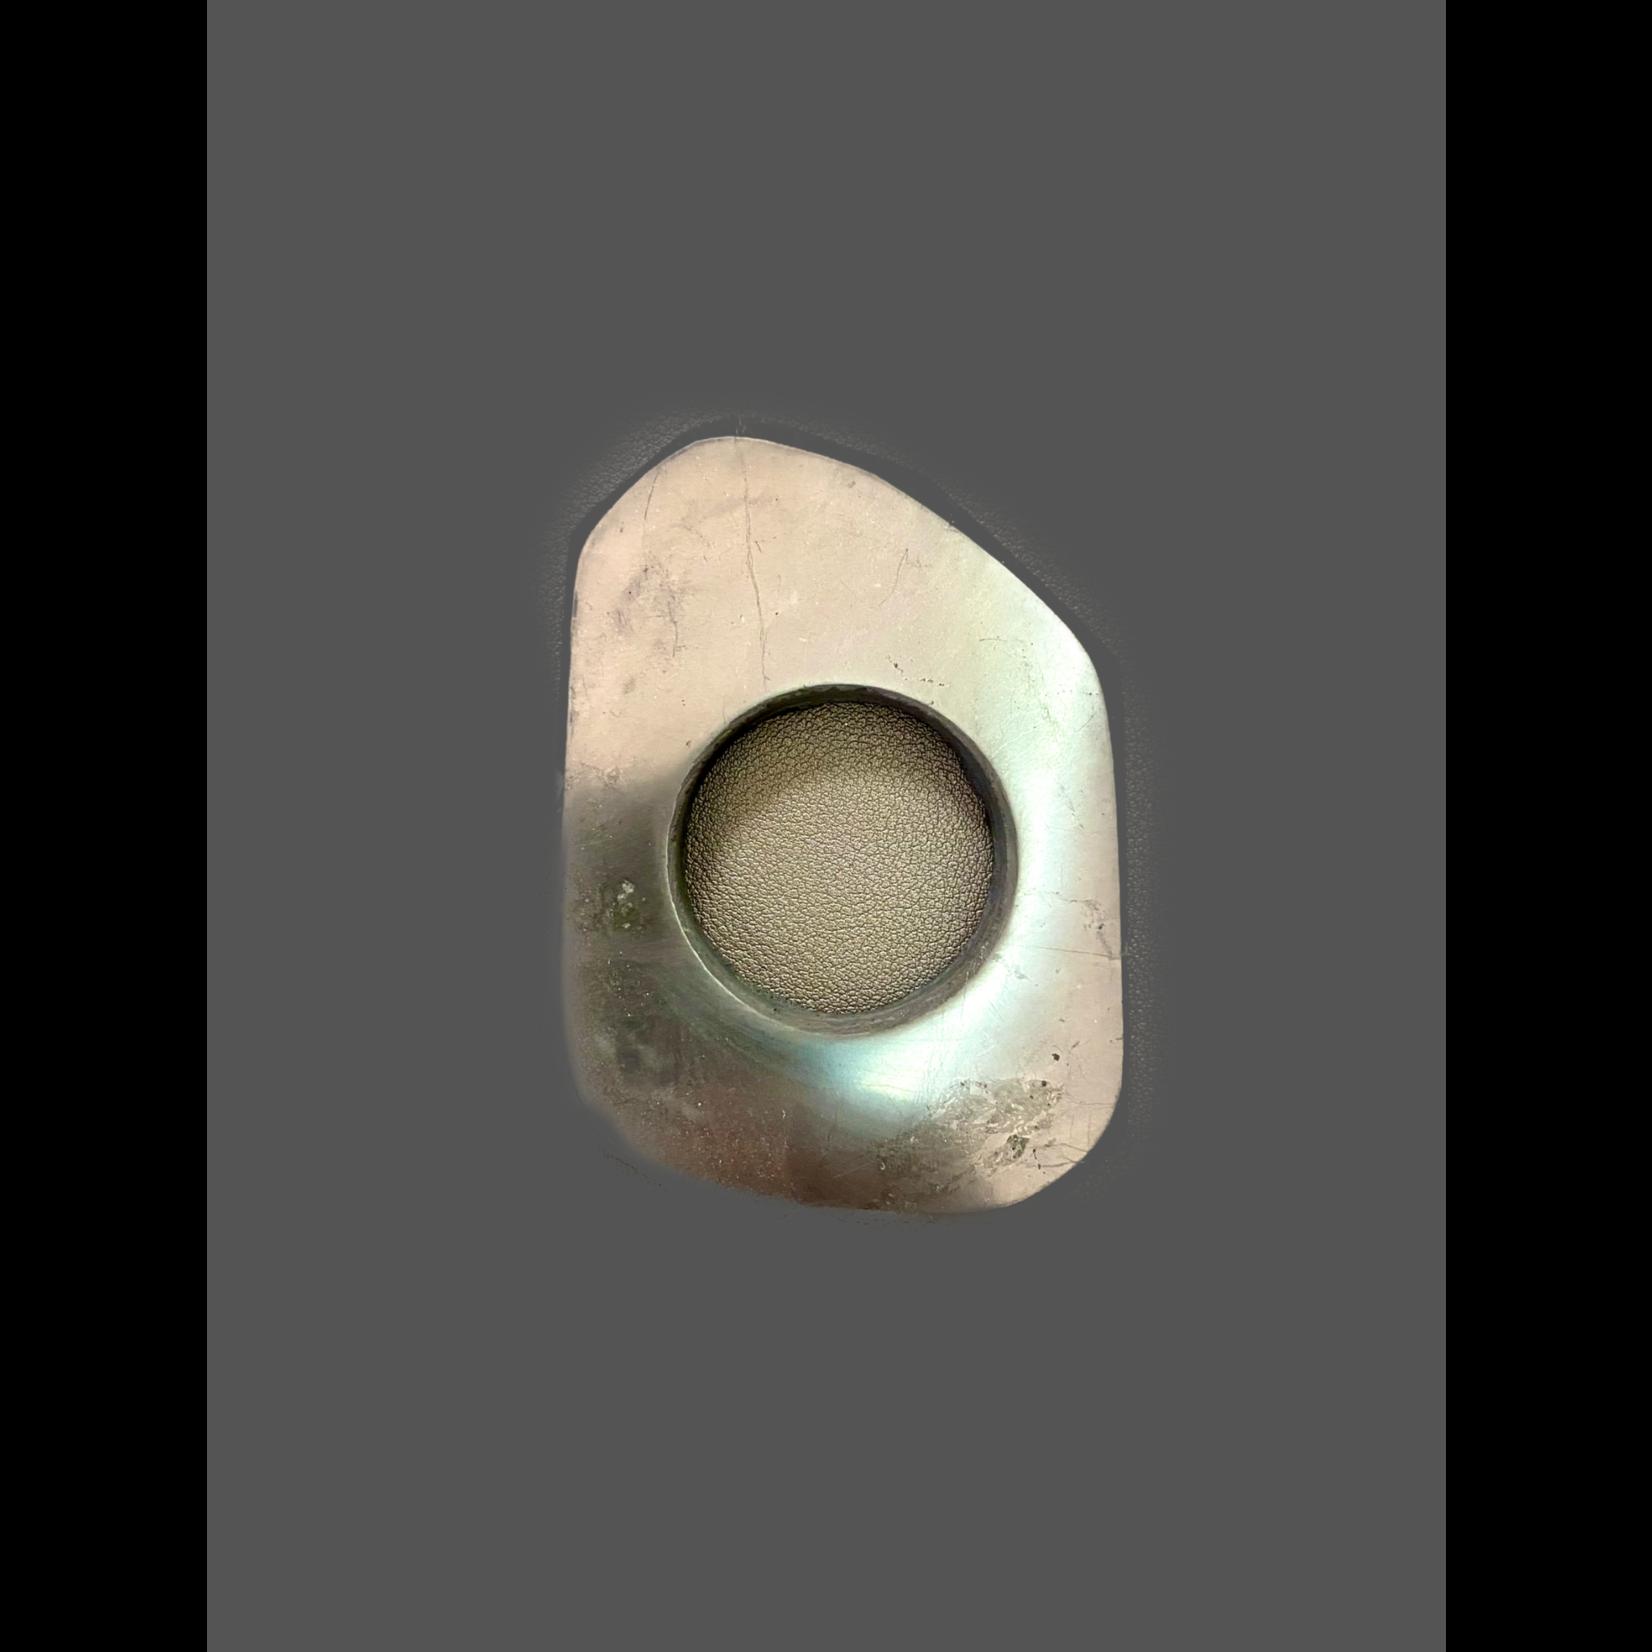 Soporte esfera shungit 7-10 cm